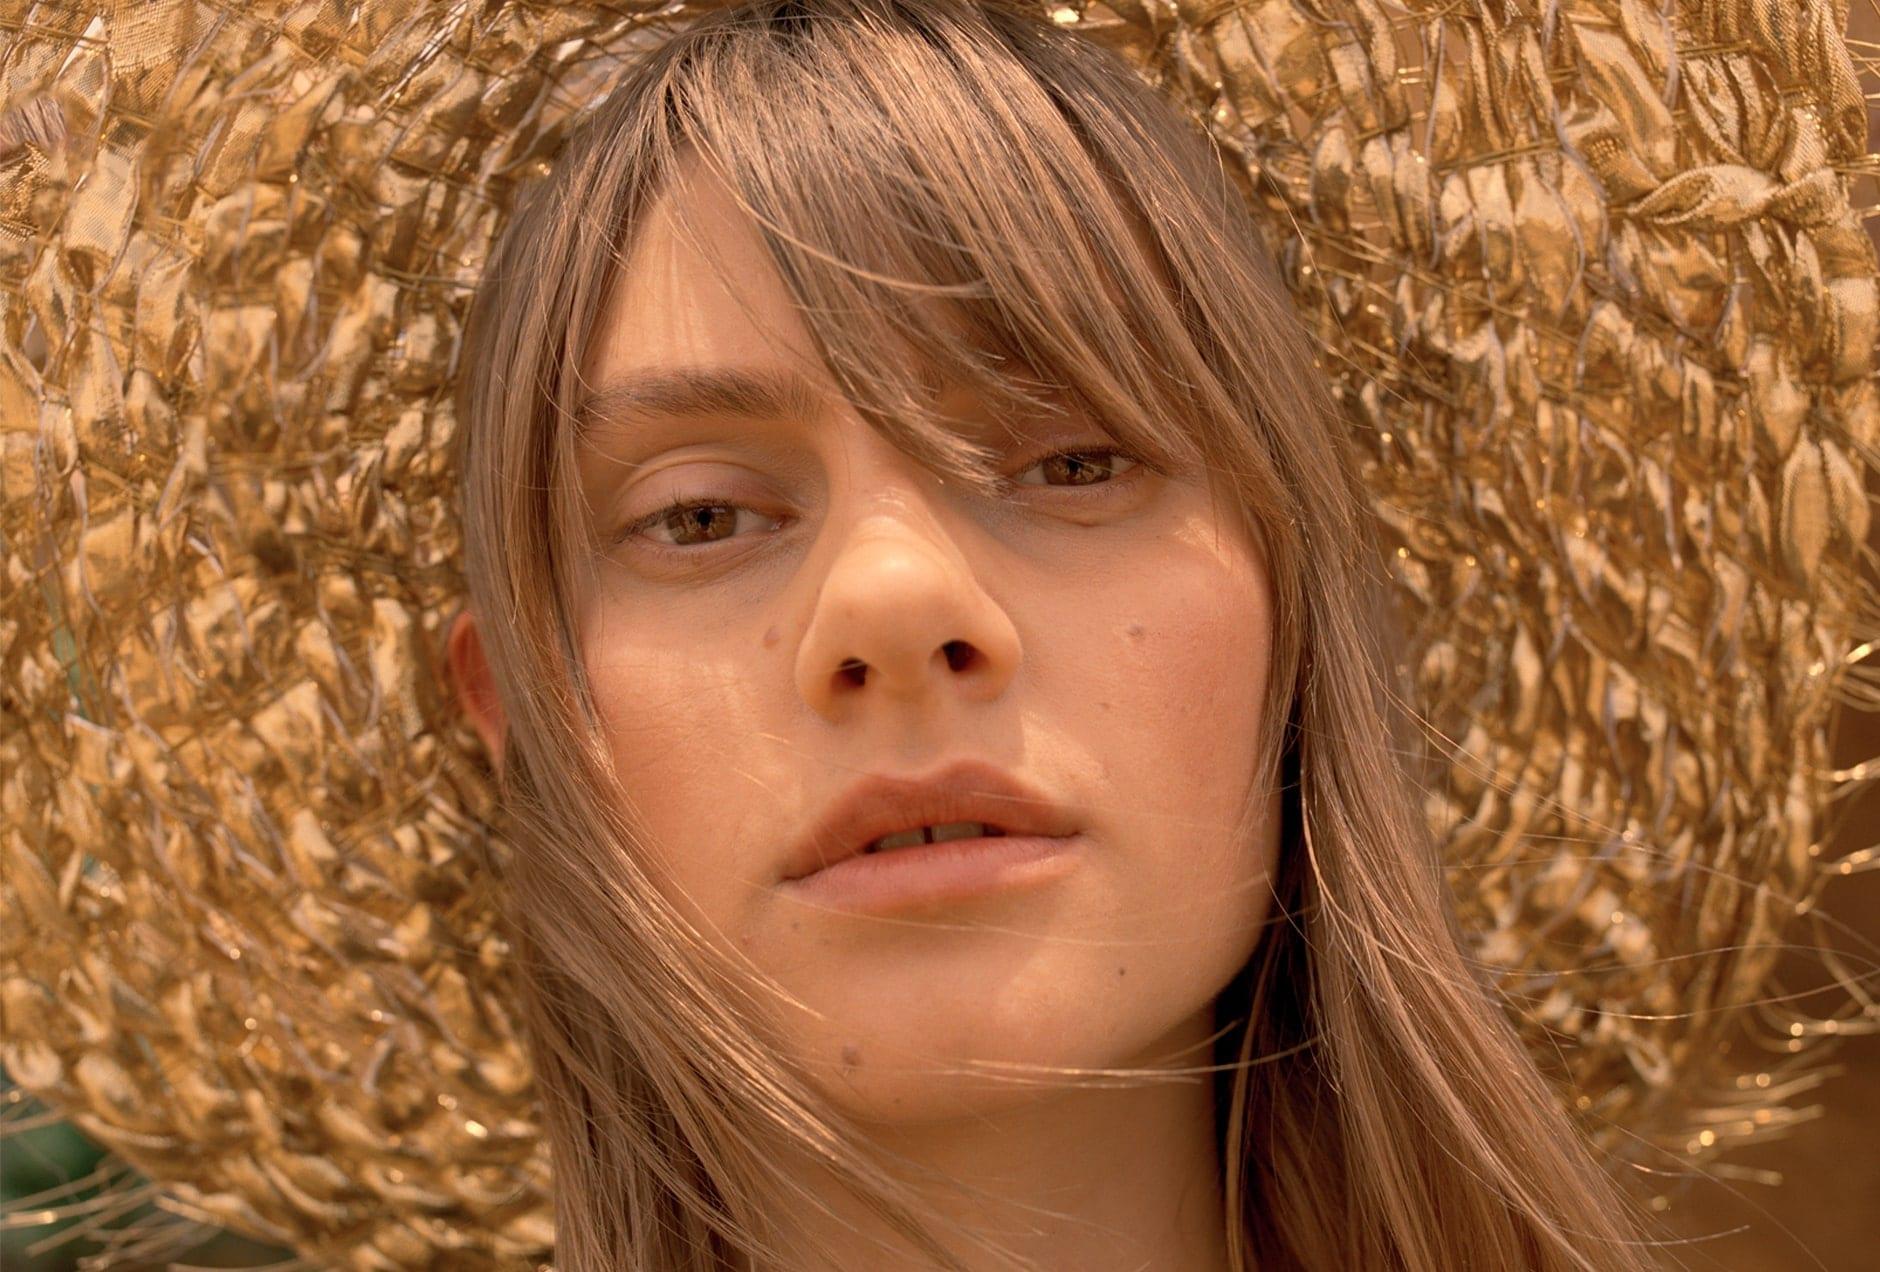 Freja Beha Erichsen is All Smiles for Russh June-July 2014